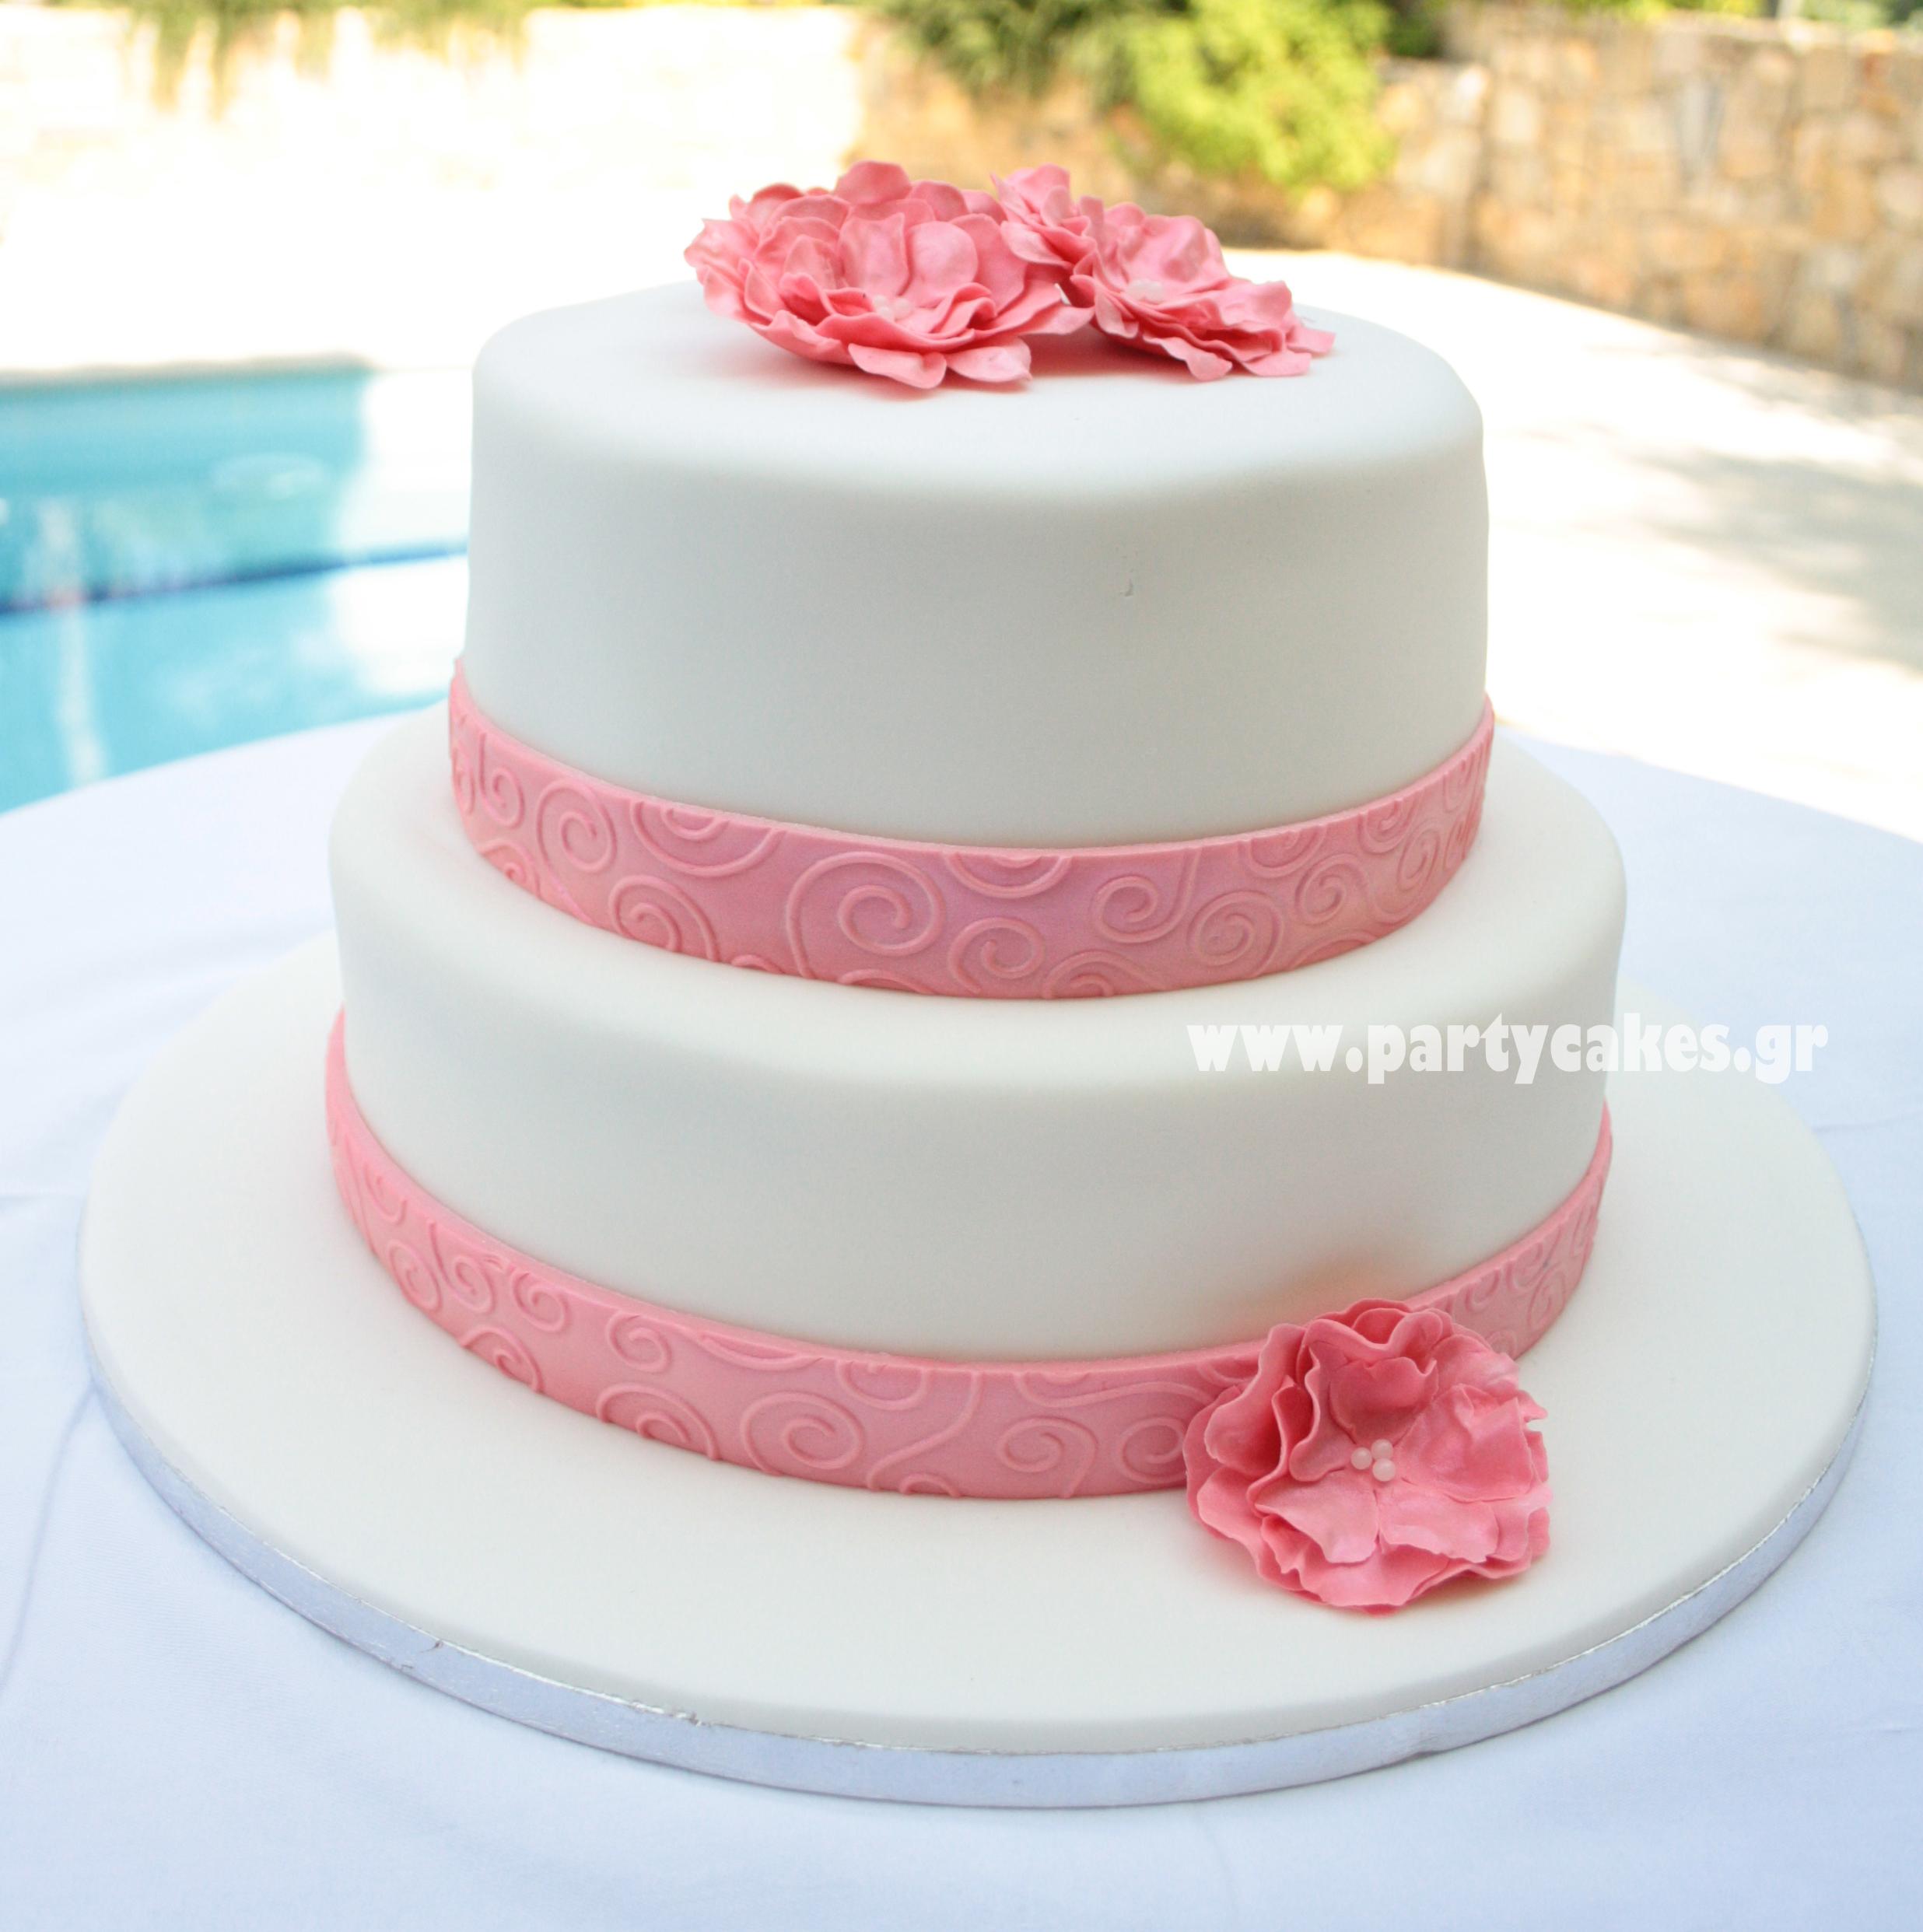 Wedding+cake+a+2+copy.jpg